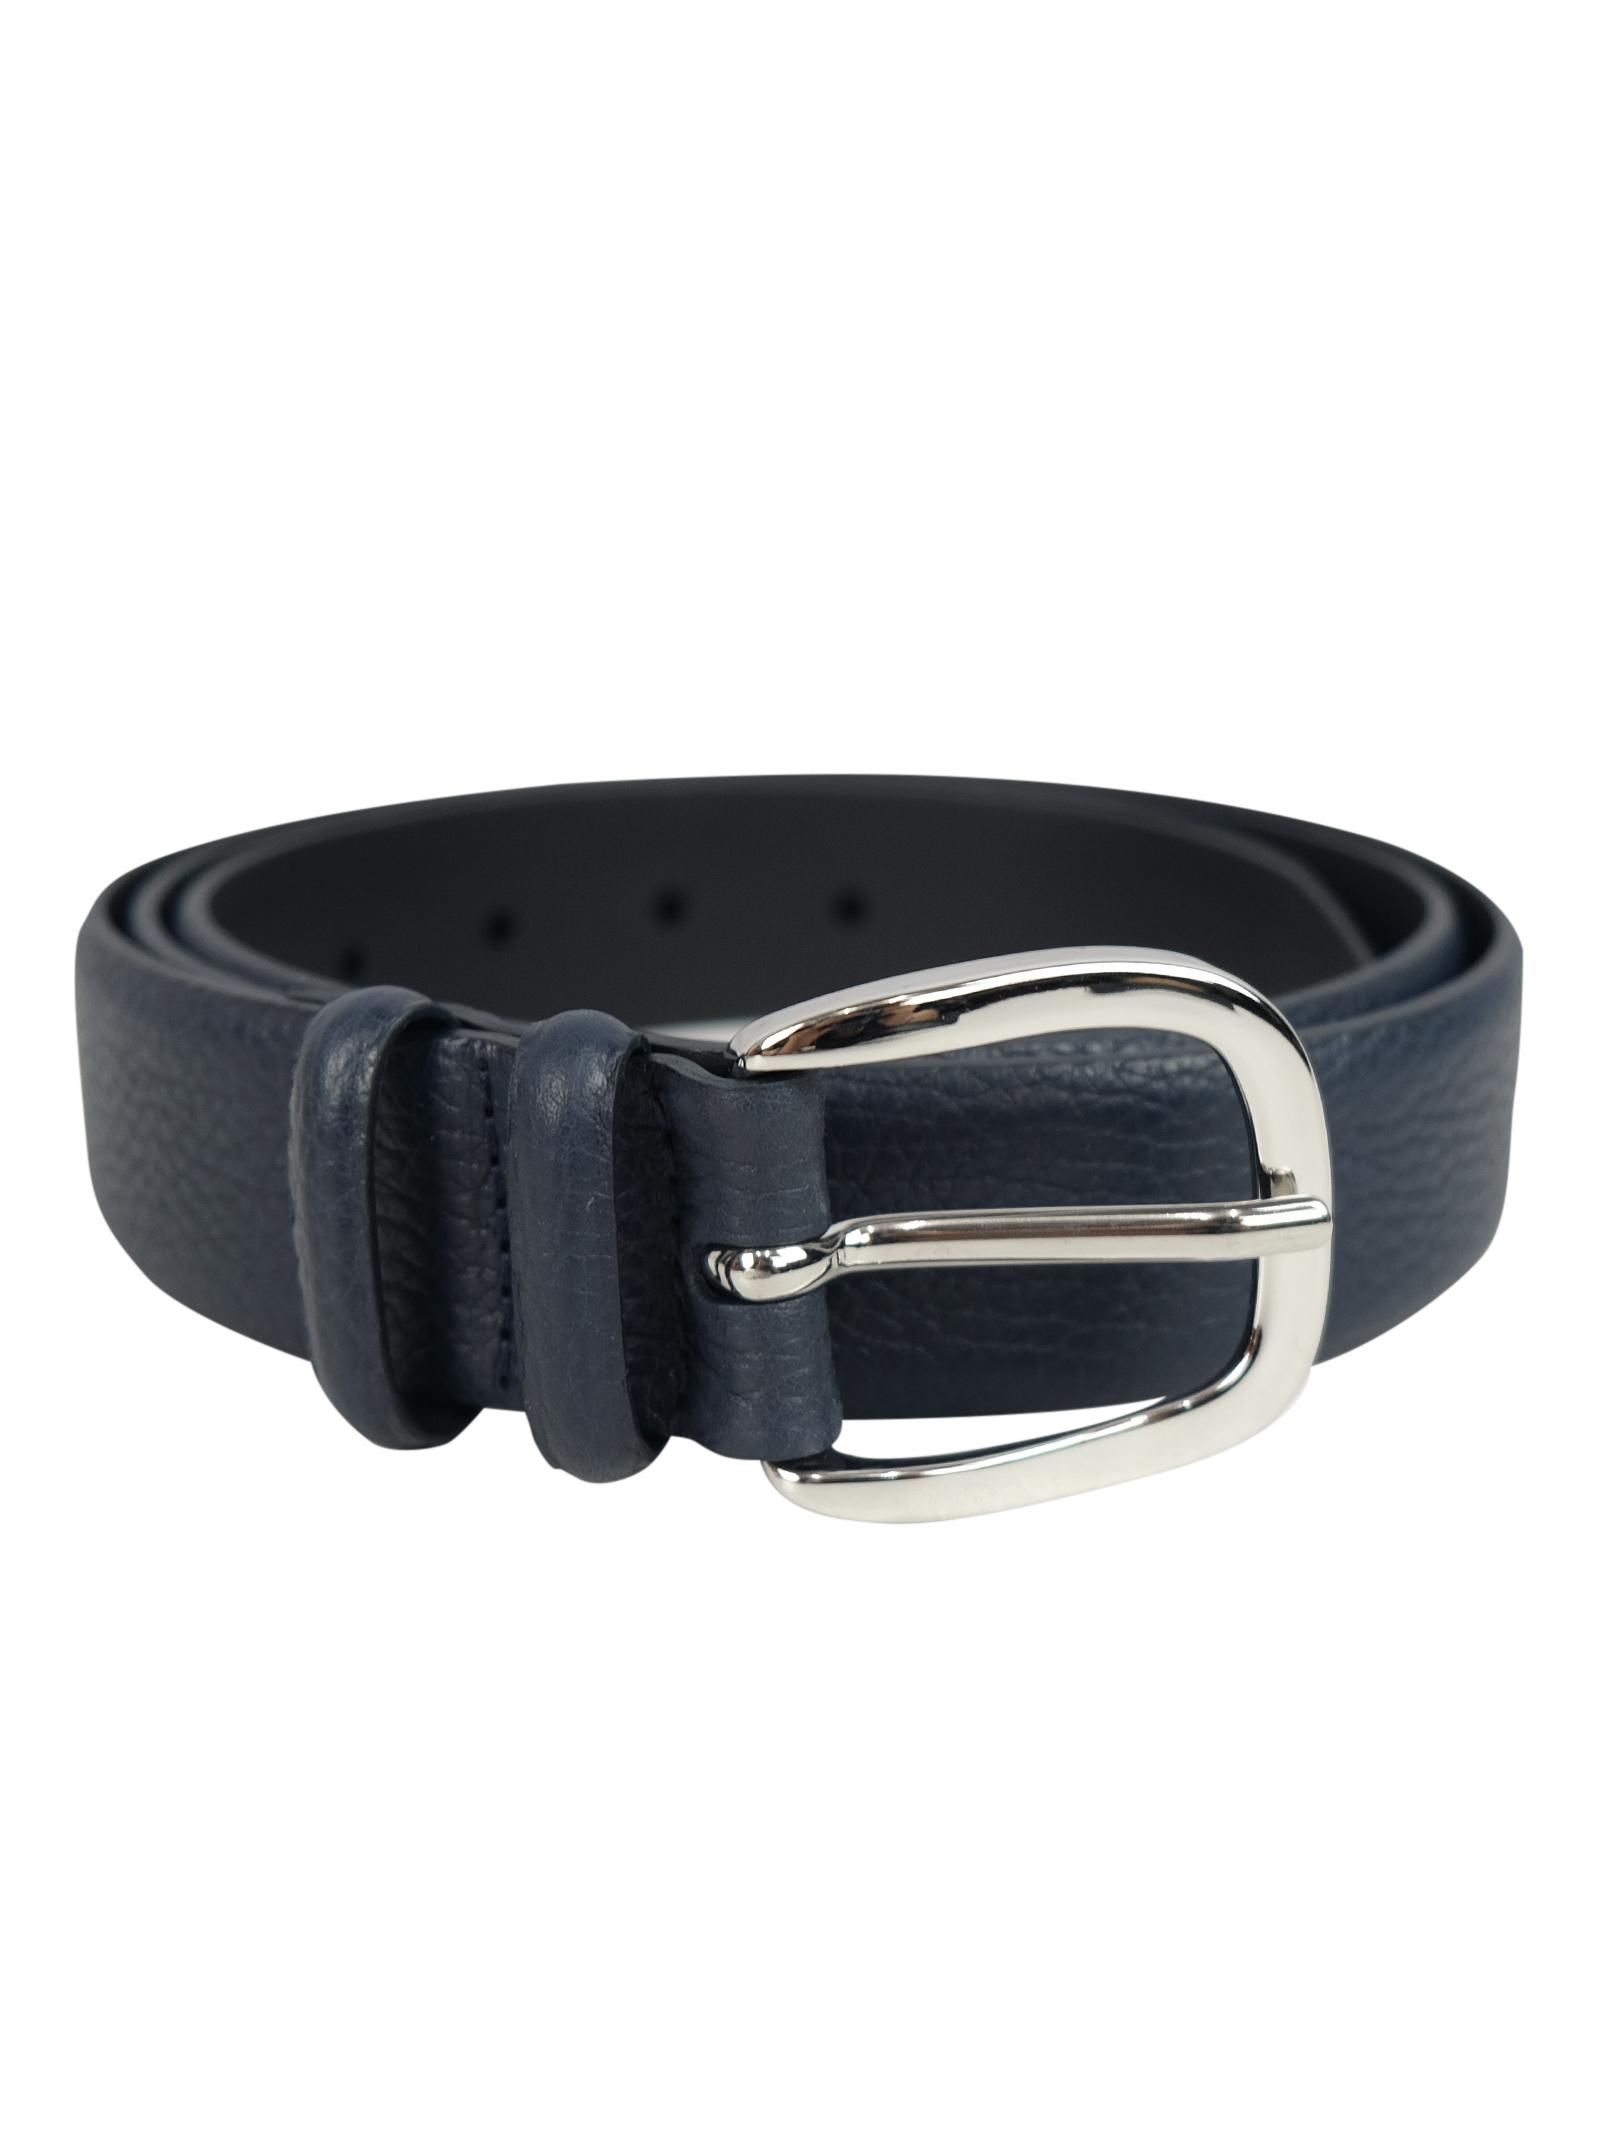 Cintura in pelle martellata ORCIANI | Cinture | 7709NAV